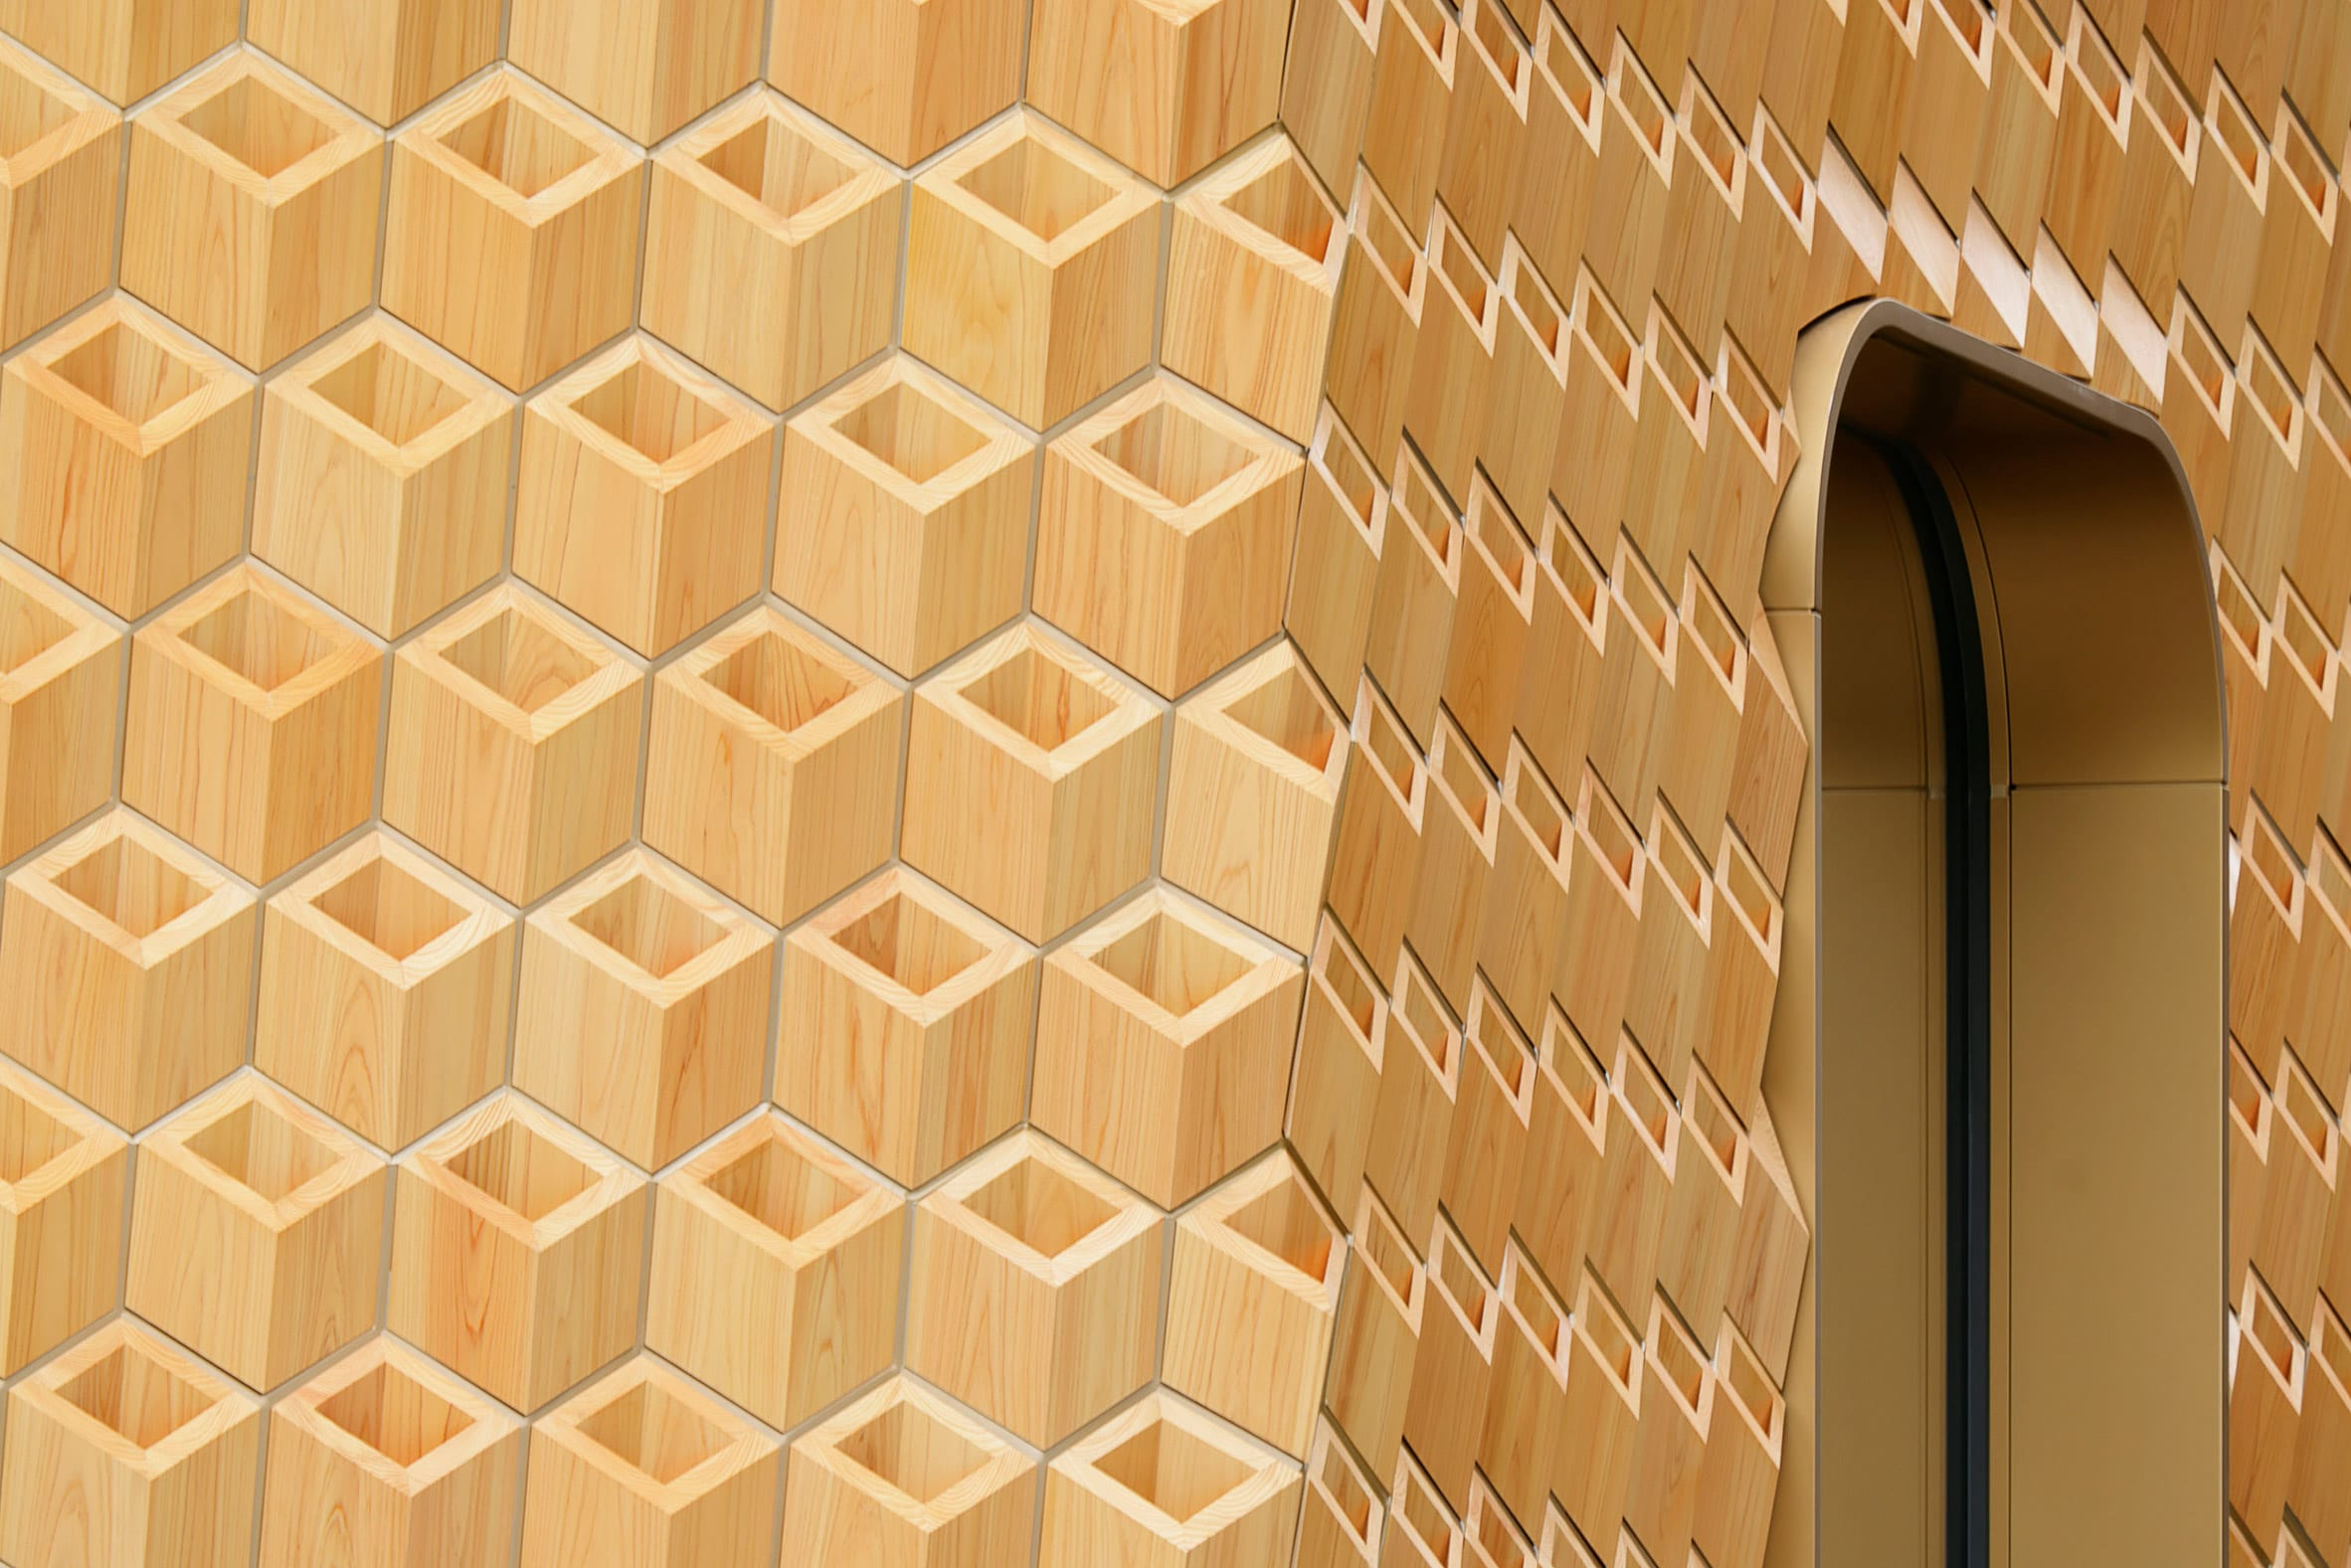 Klein Dytham Architecture created interlocking units for the facade